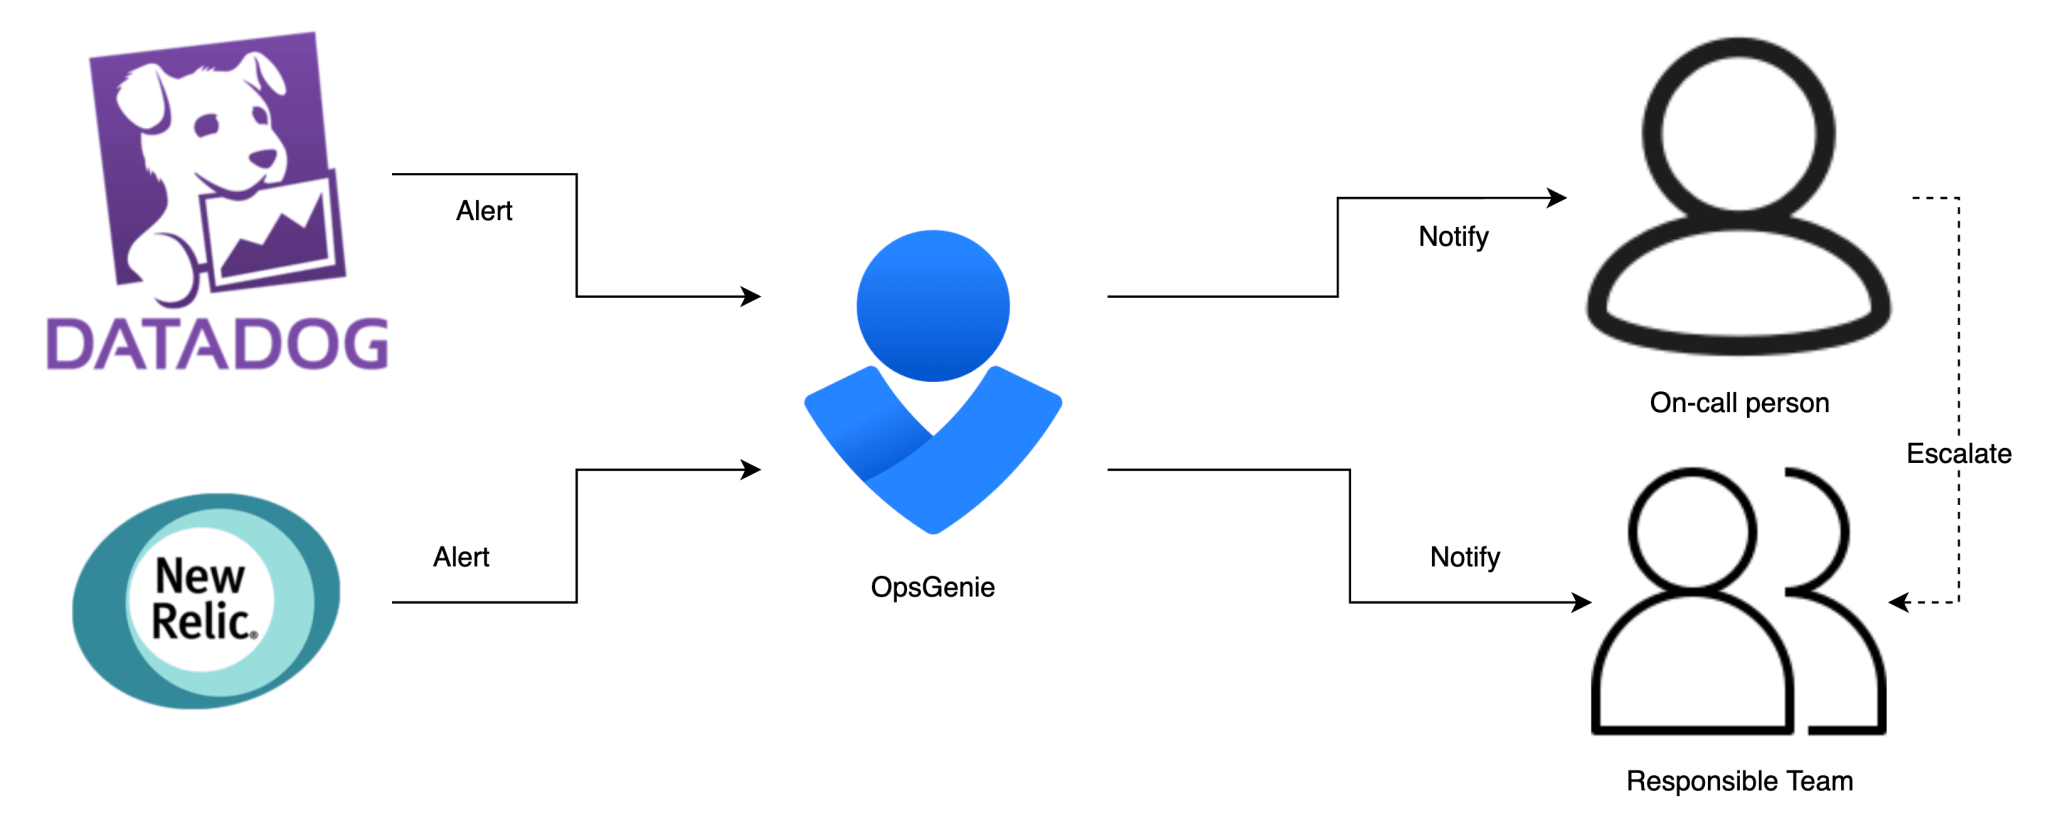 OpsGenie tool explained